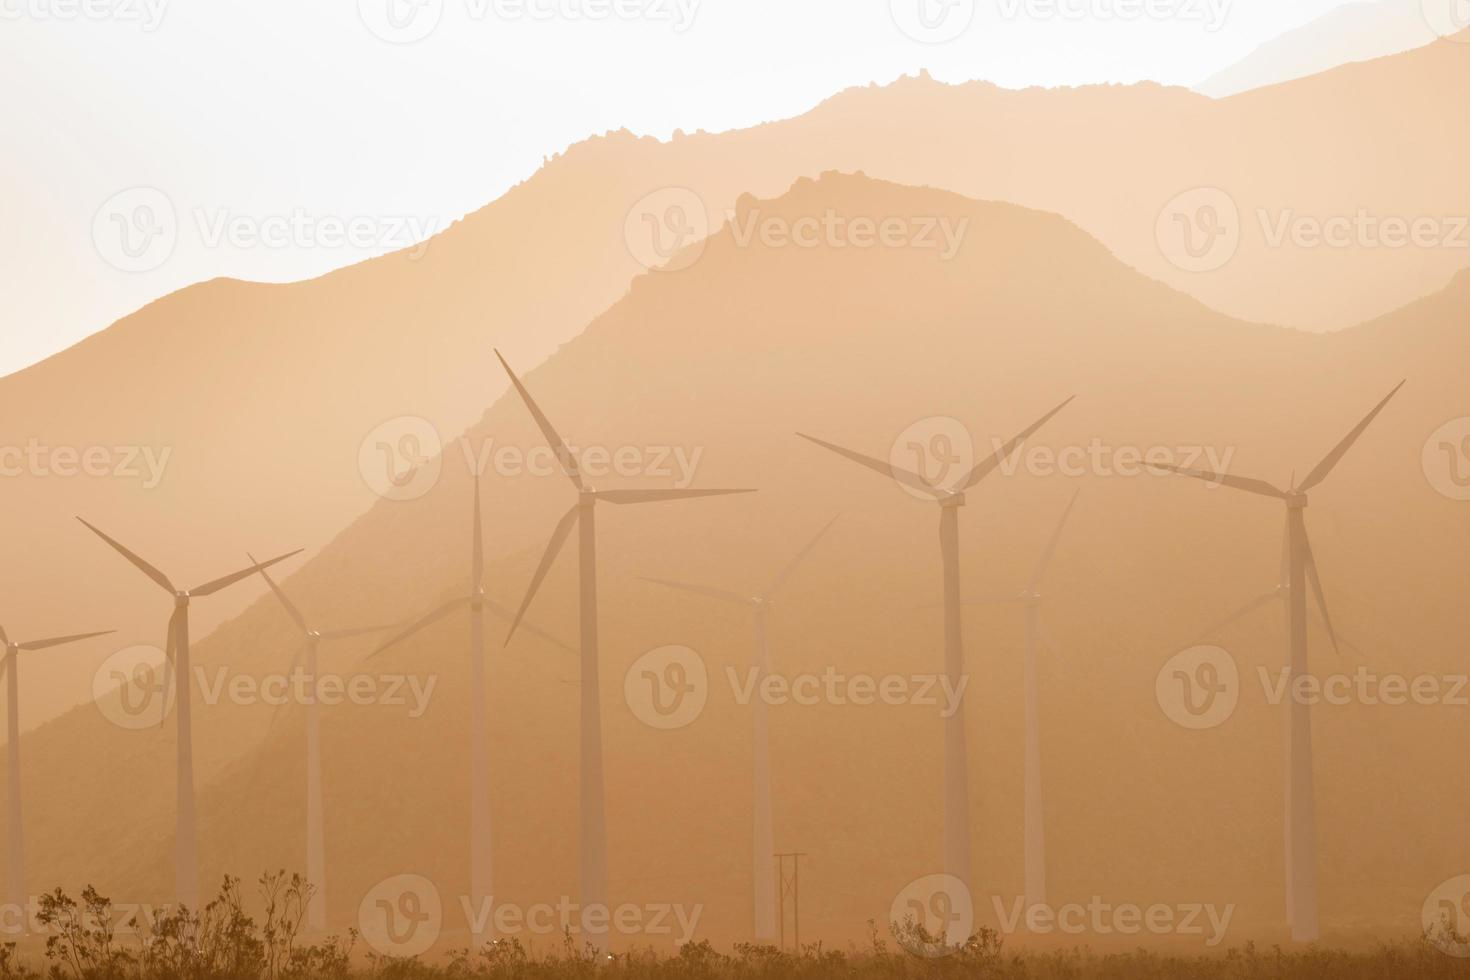 turbinas eólicas de energia verde limpa alternativa no deserto foto